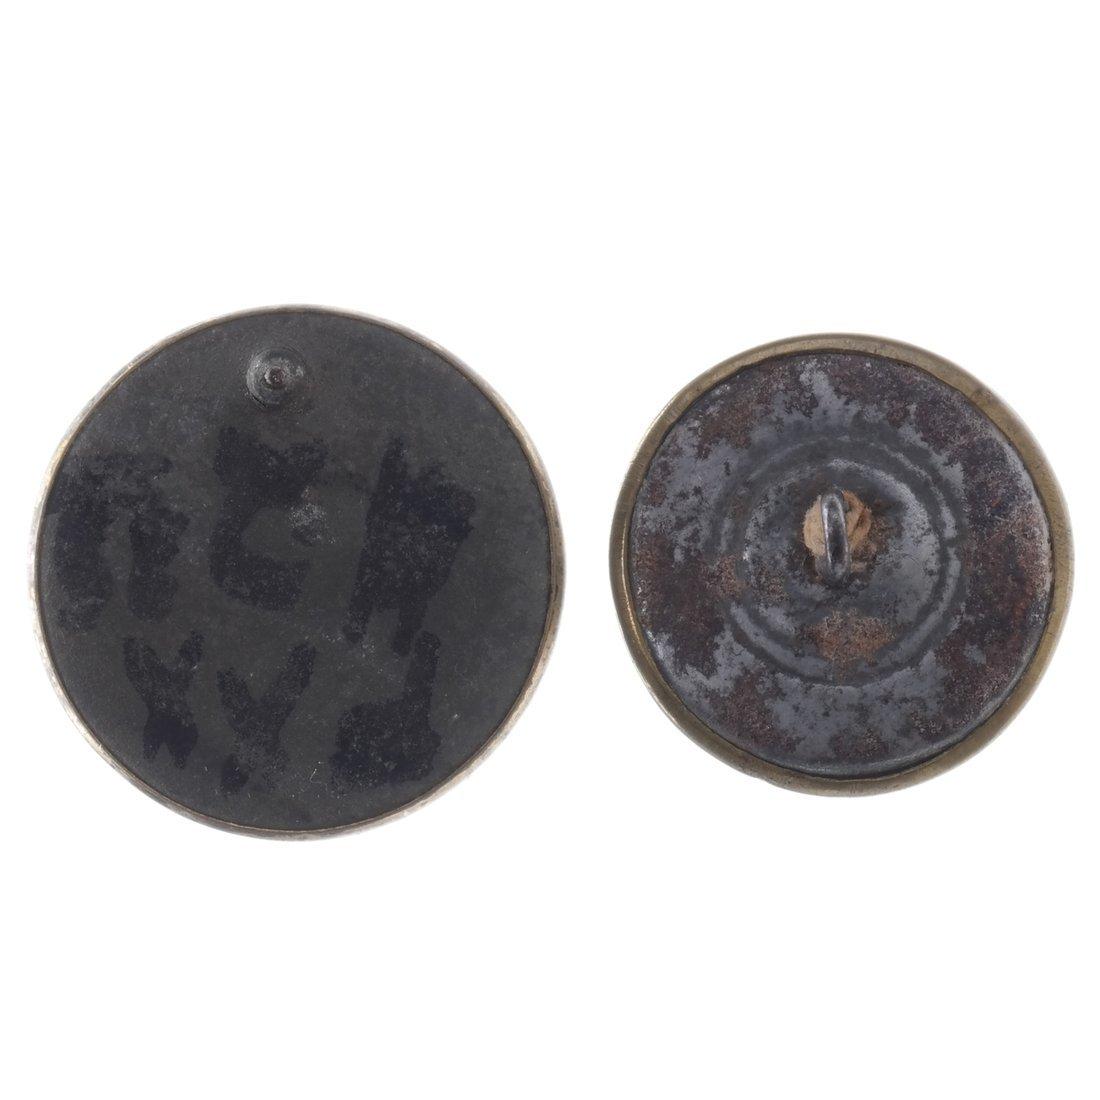 Grant & Colfax Two 1868 Jugate Ferrotypes - 4